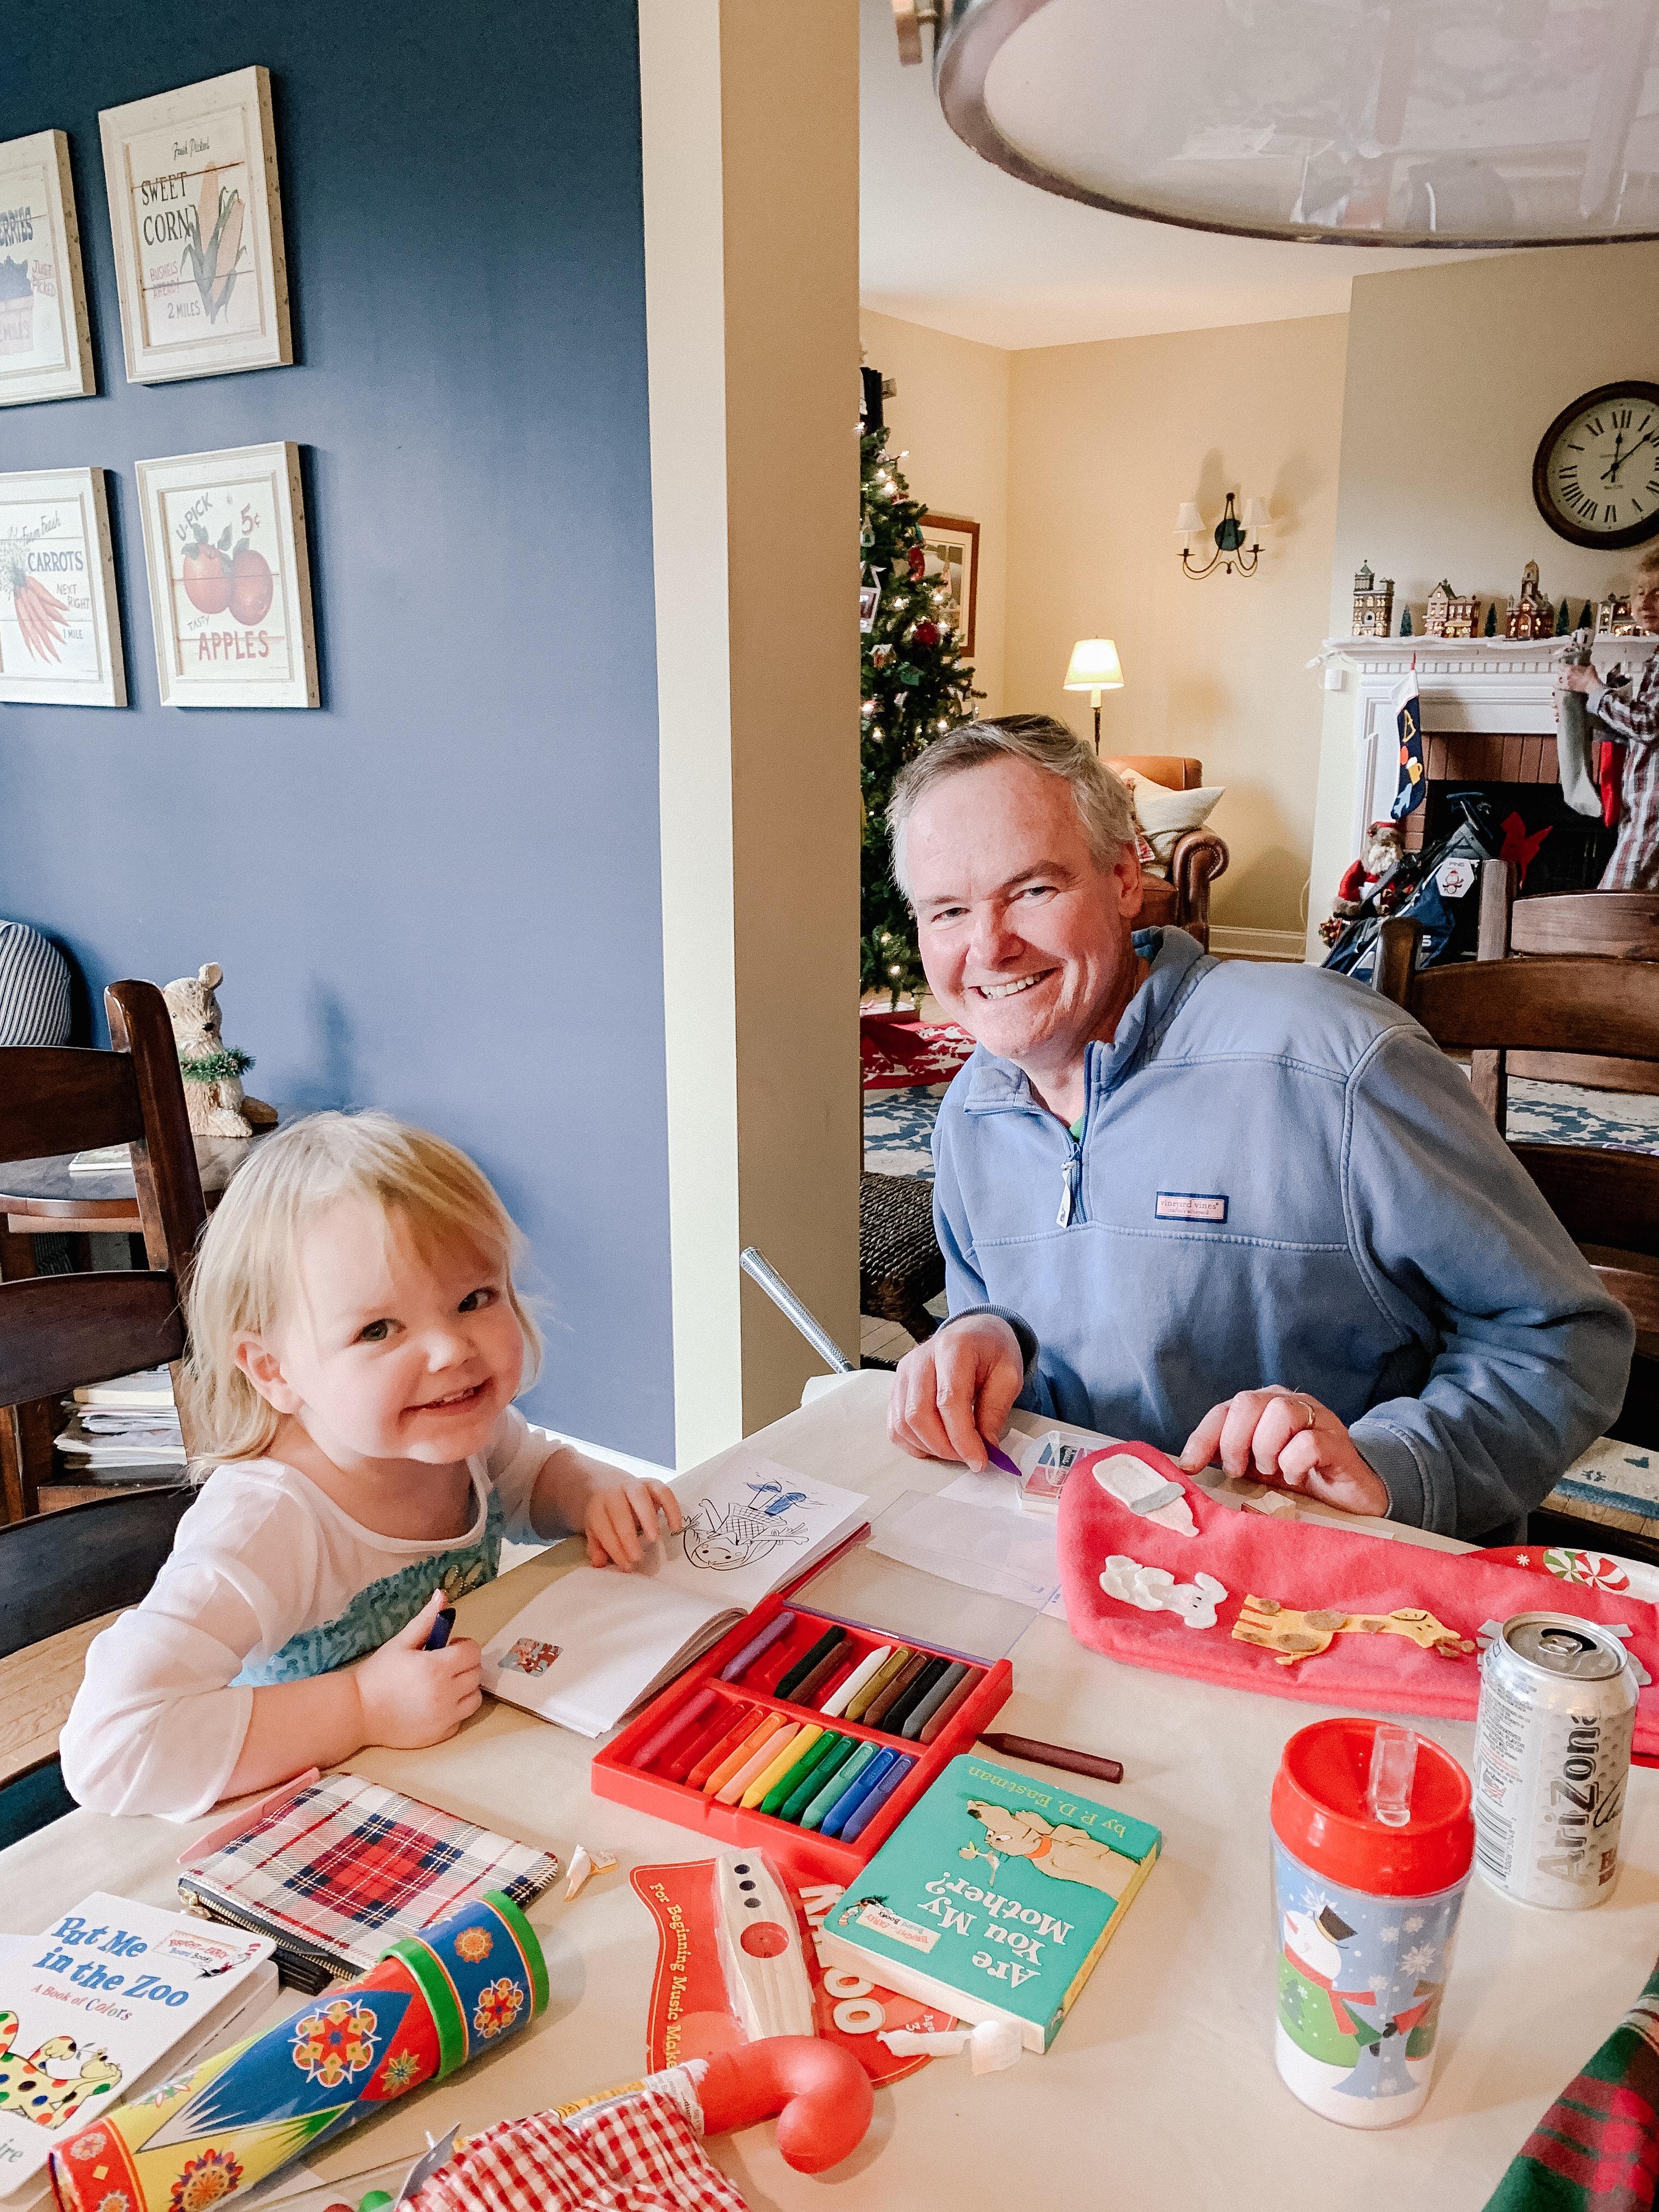 Emma and her grandpa